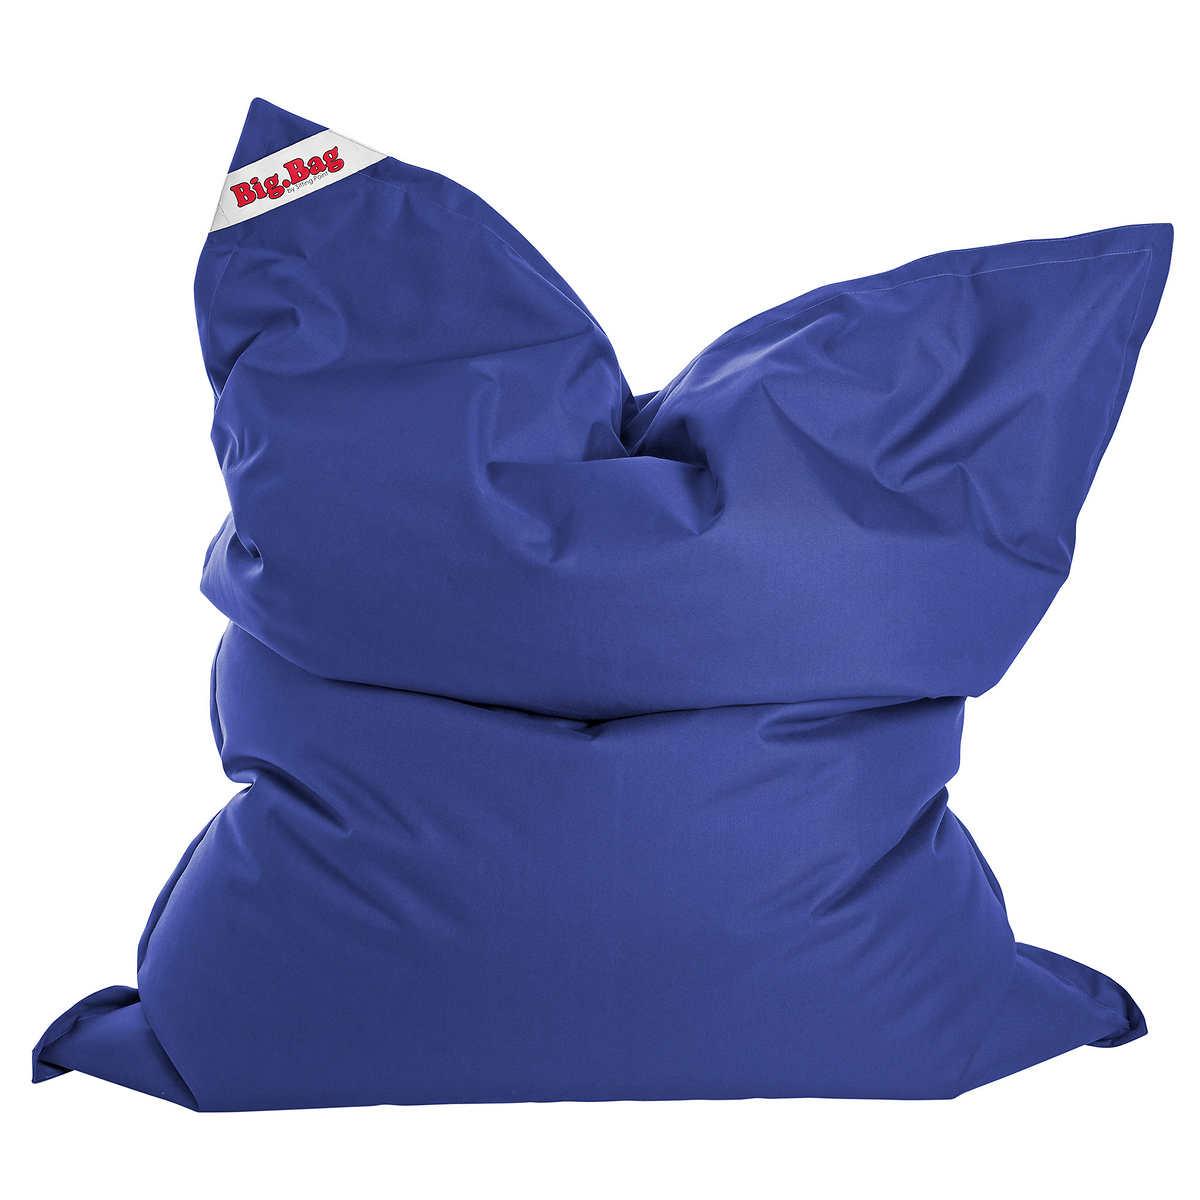 Member Only Item BigBag Brava XL Bean Bag